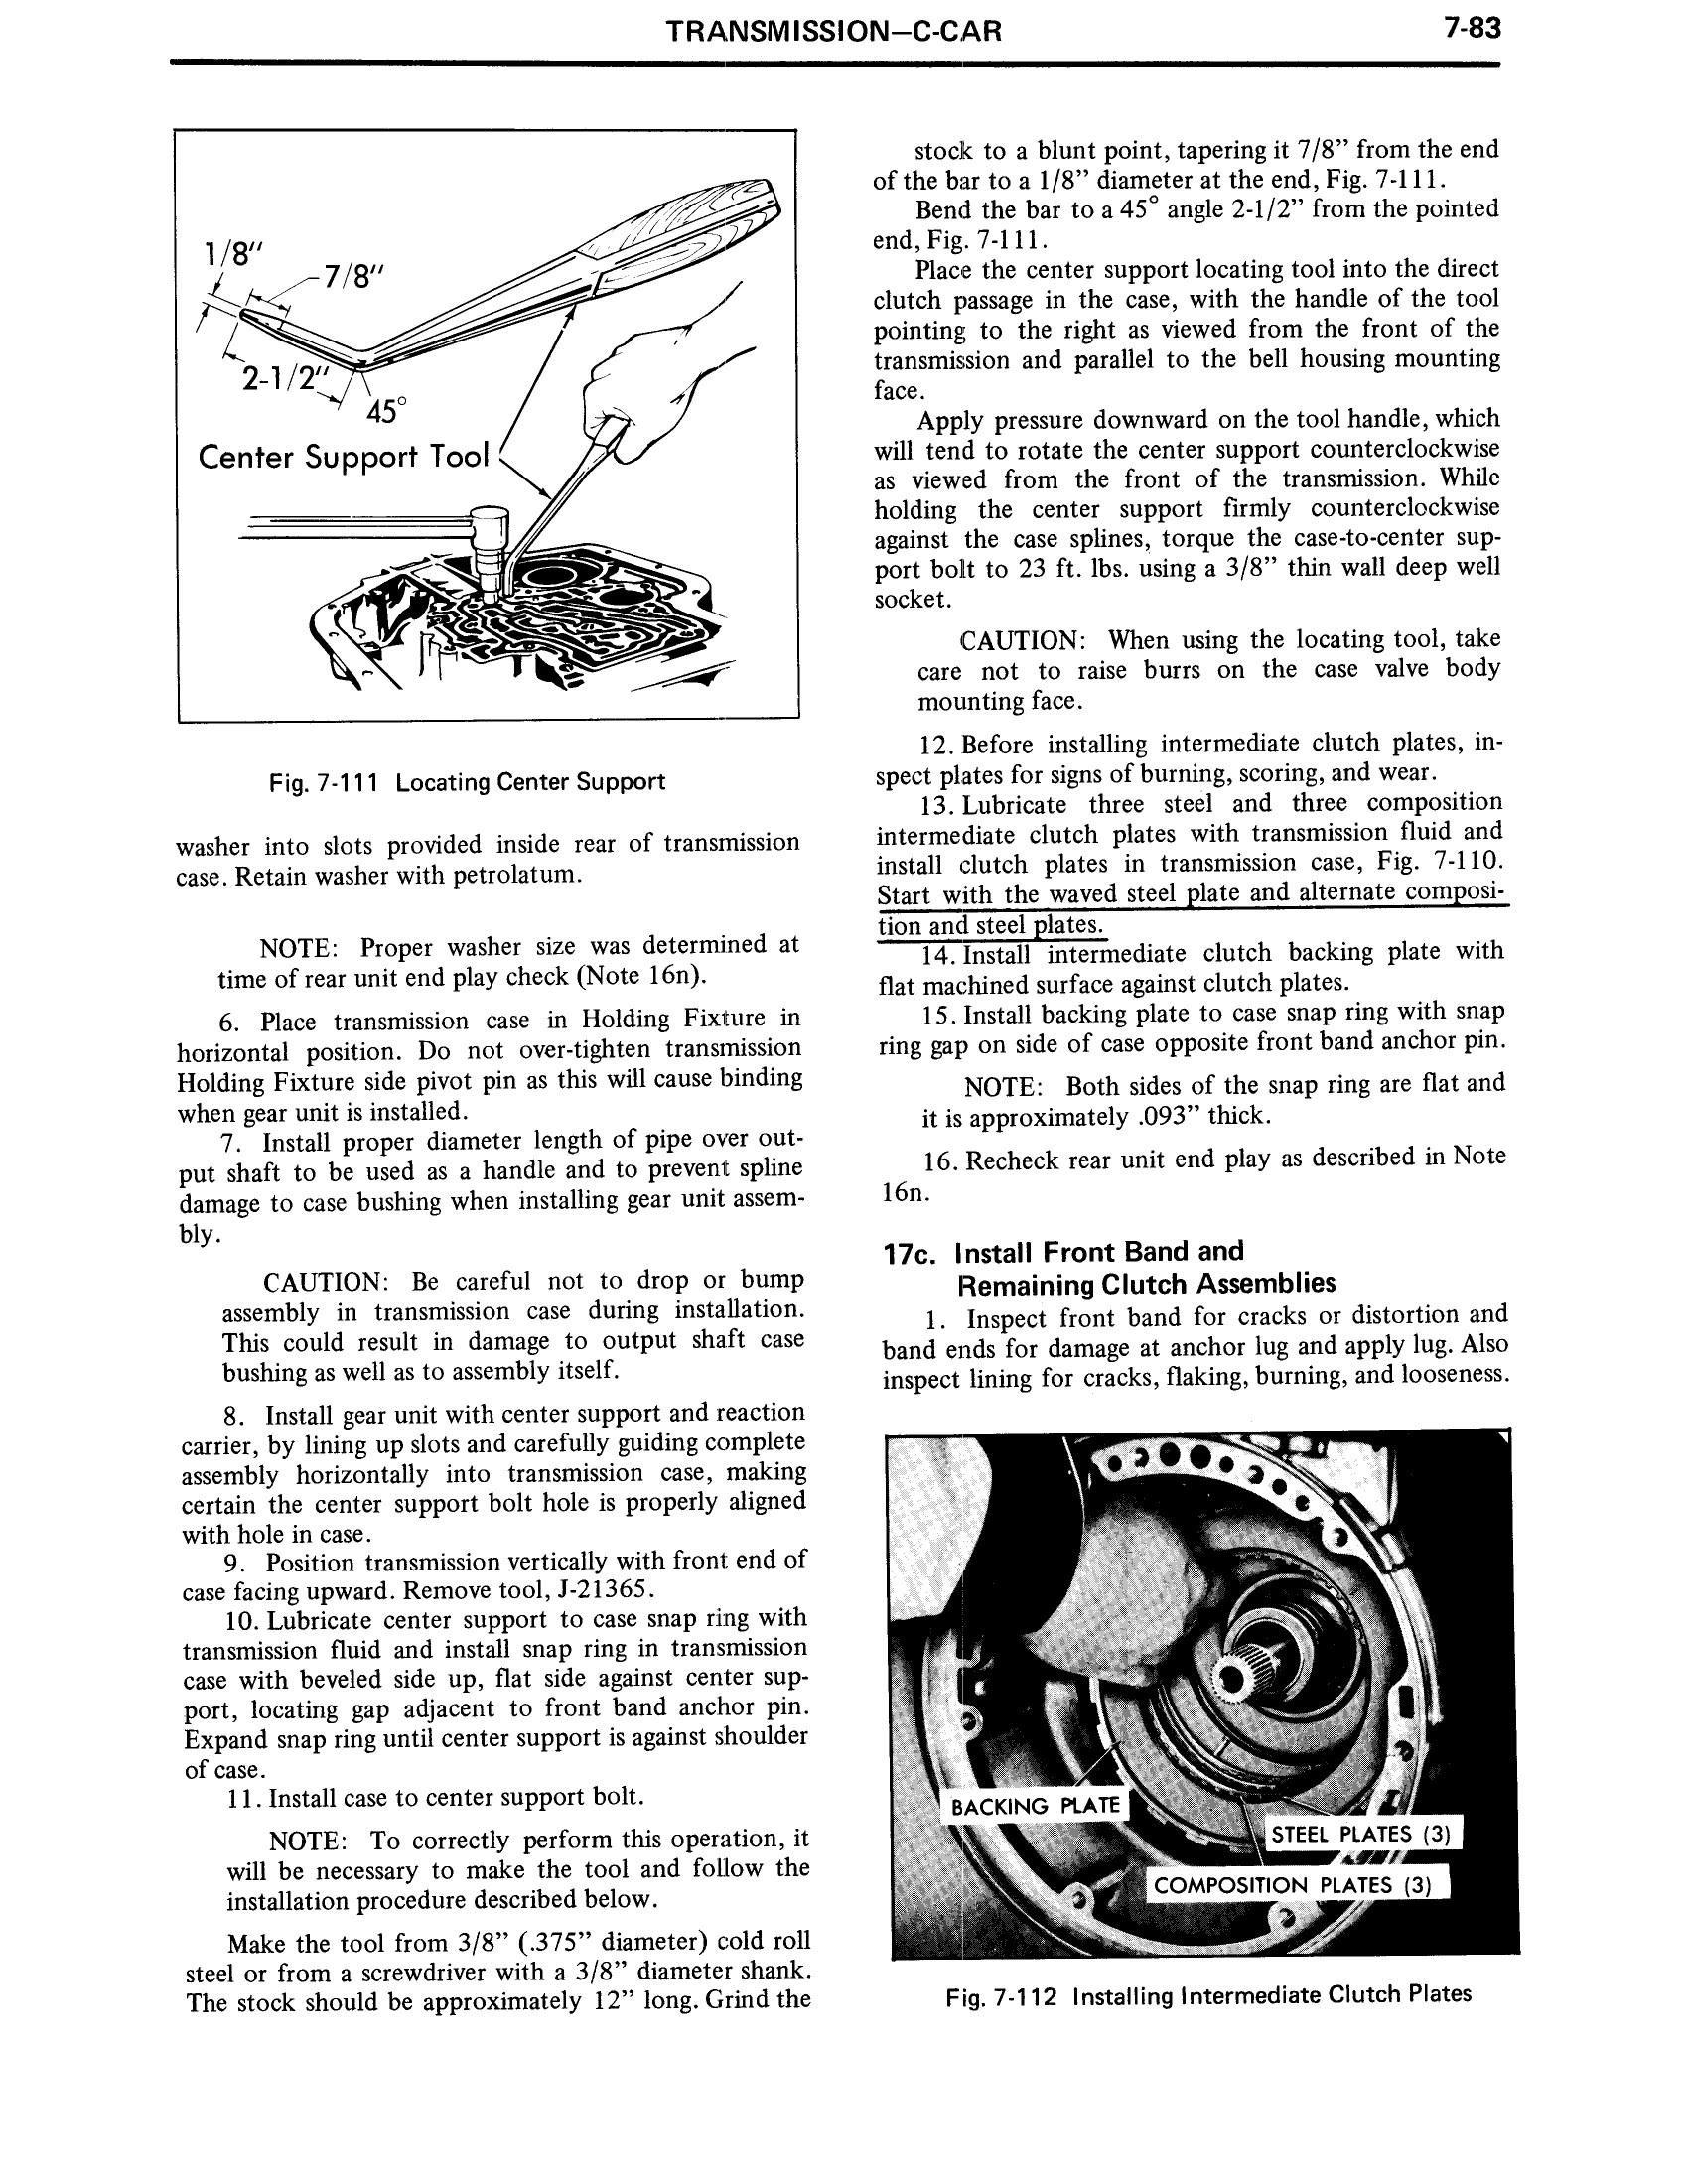 1971 Cadillac Shop Manual- Transmission Page 83 of 156